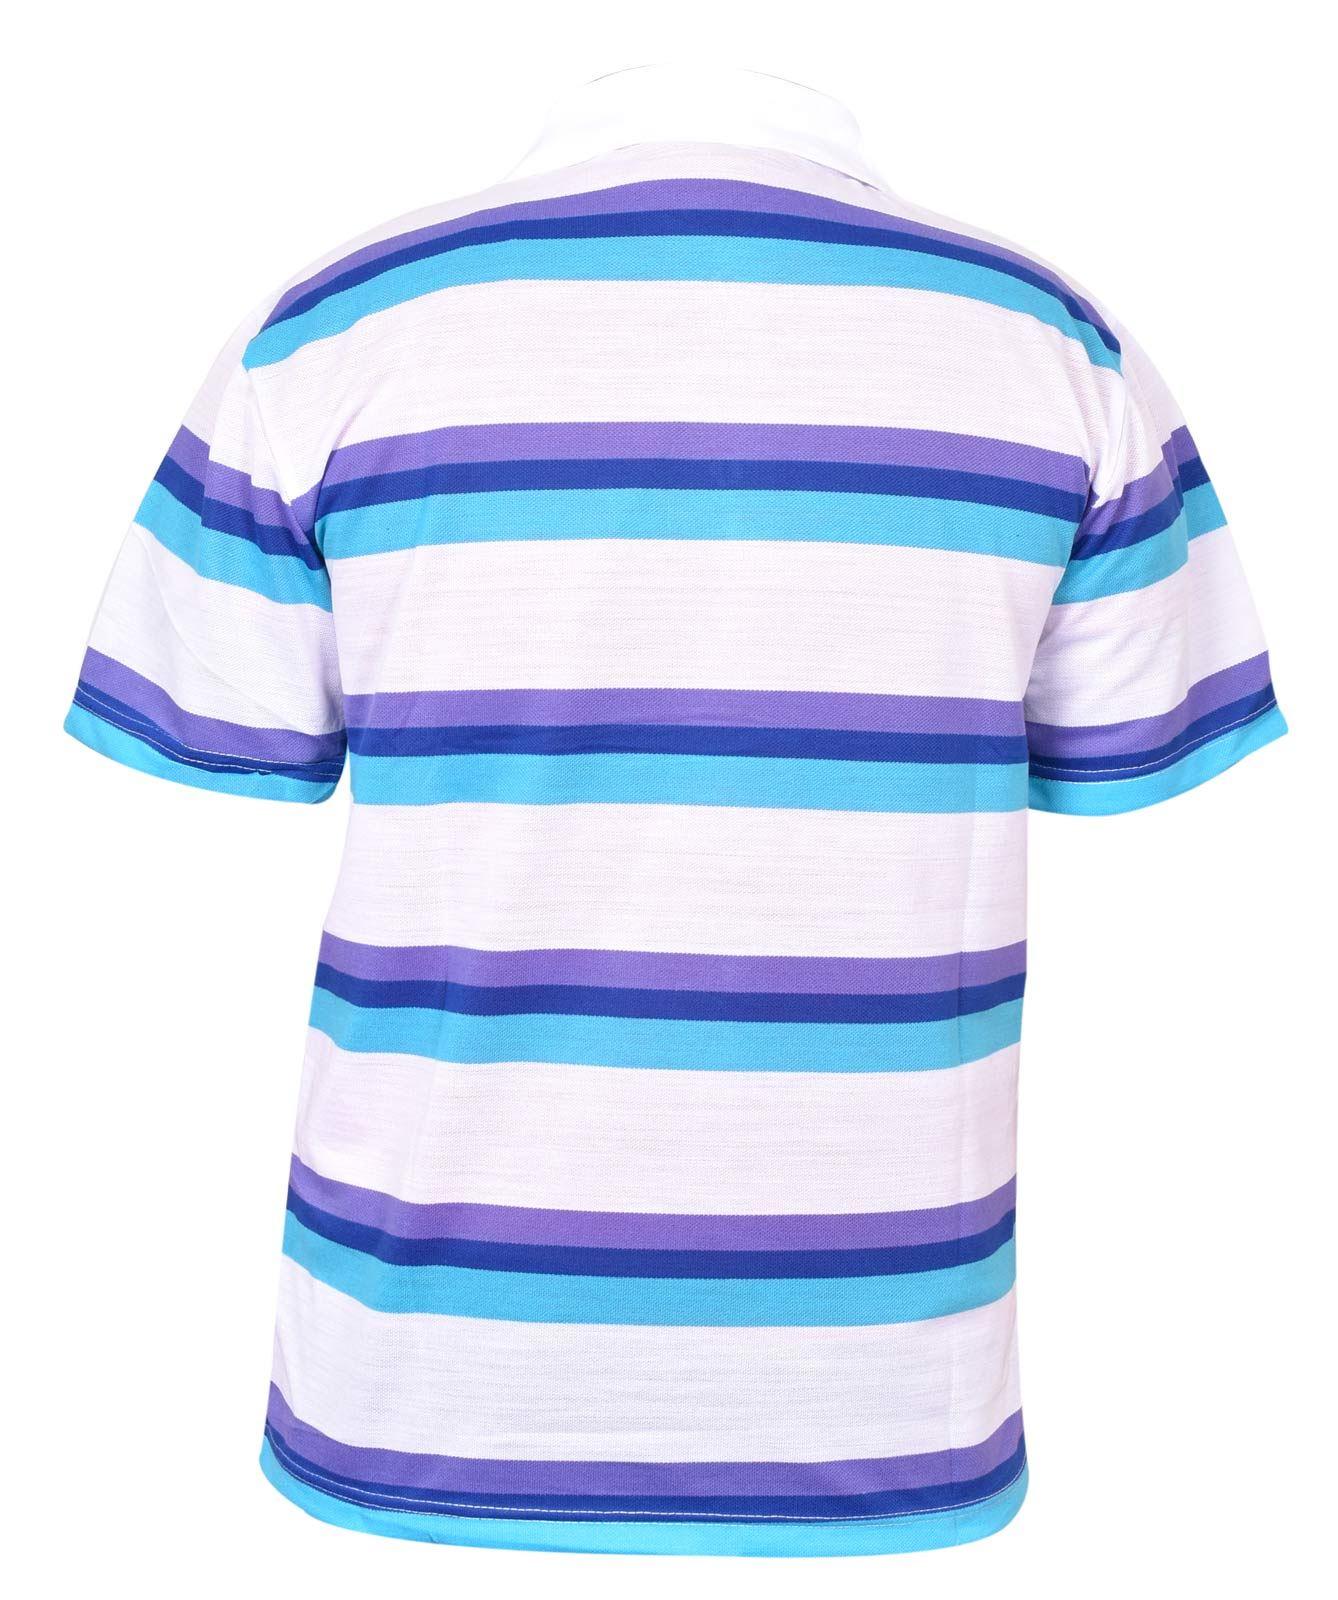 Mens-T-Shirts-Yarn-Dyed-Strip-Pocket-Polo-Shirt-Top-Multi-Colour-Size-M-3XL thumbnail 46